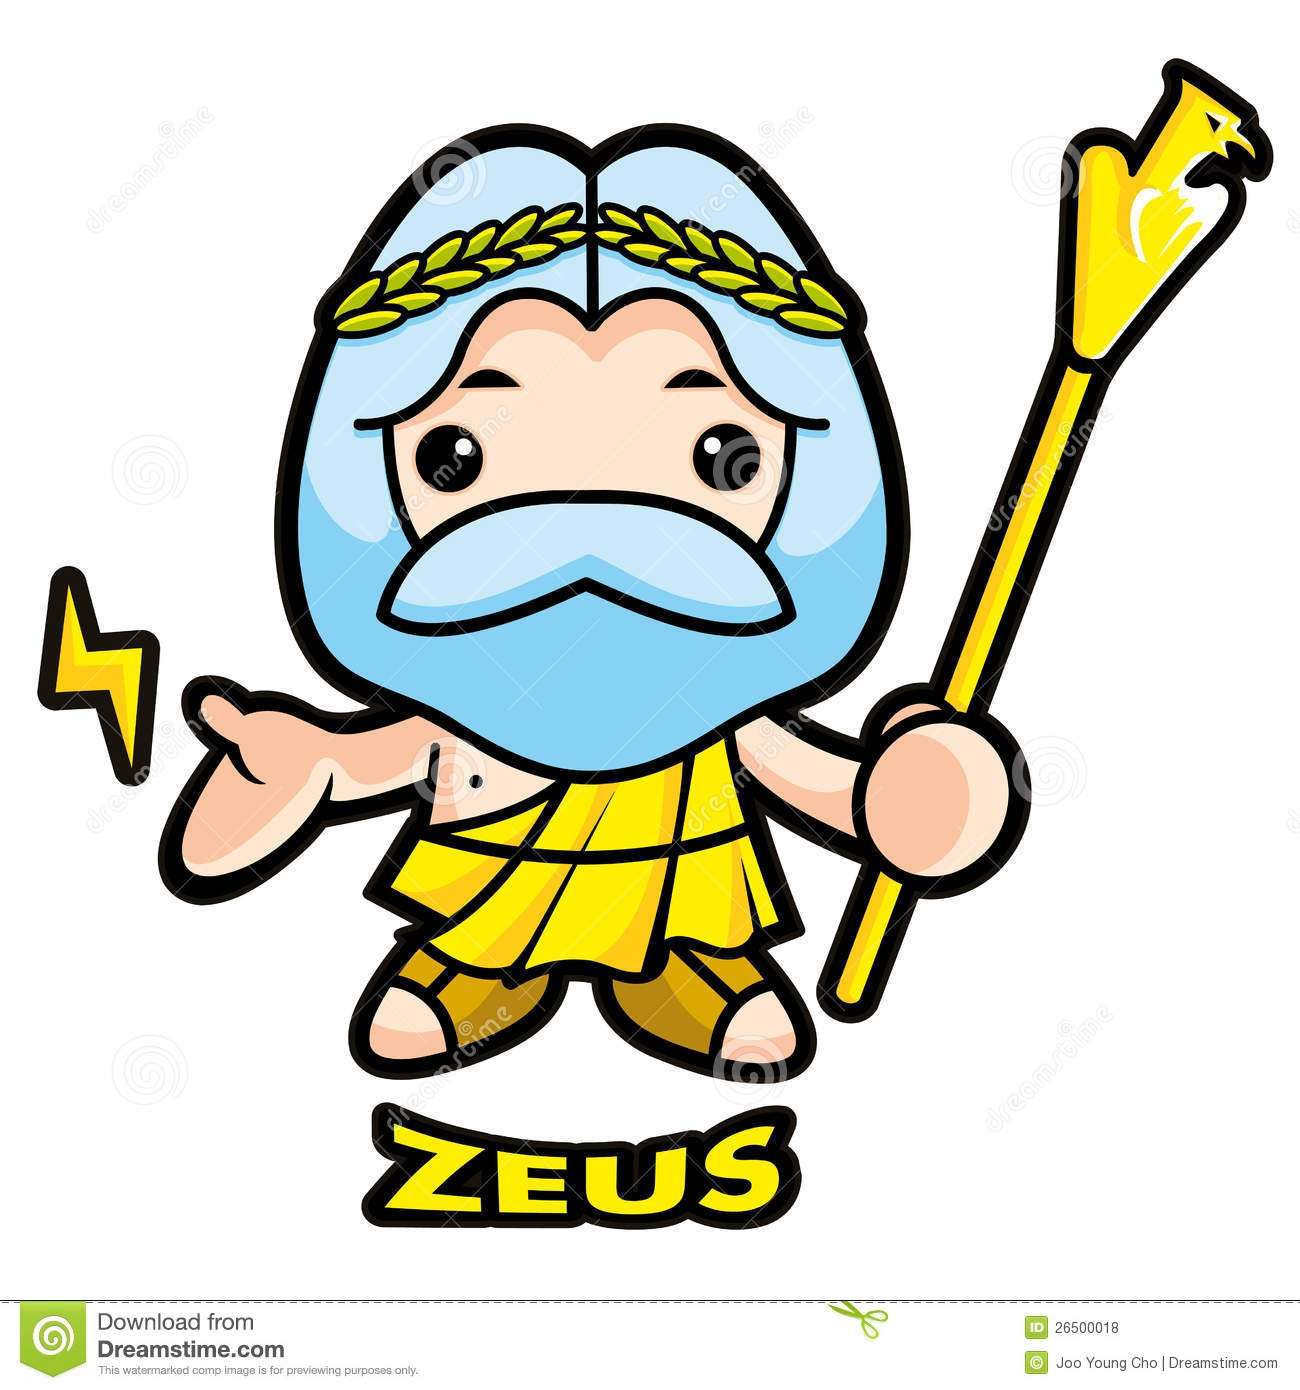 Zeus clipart #1, Download drawings